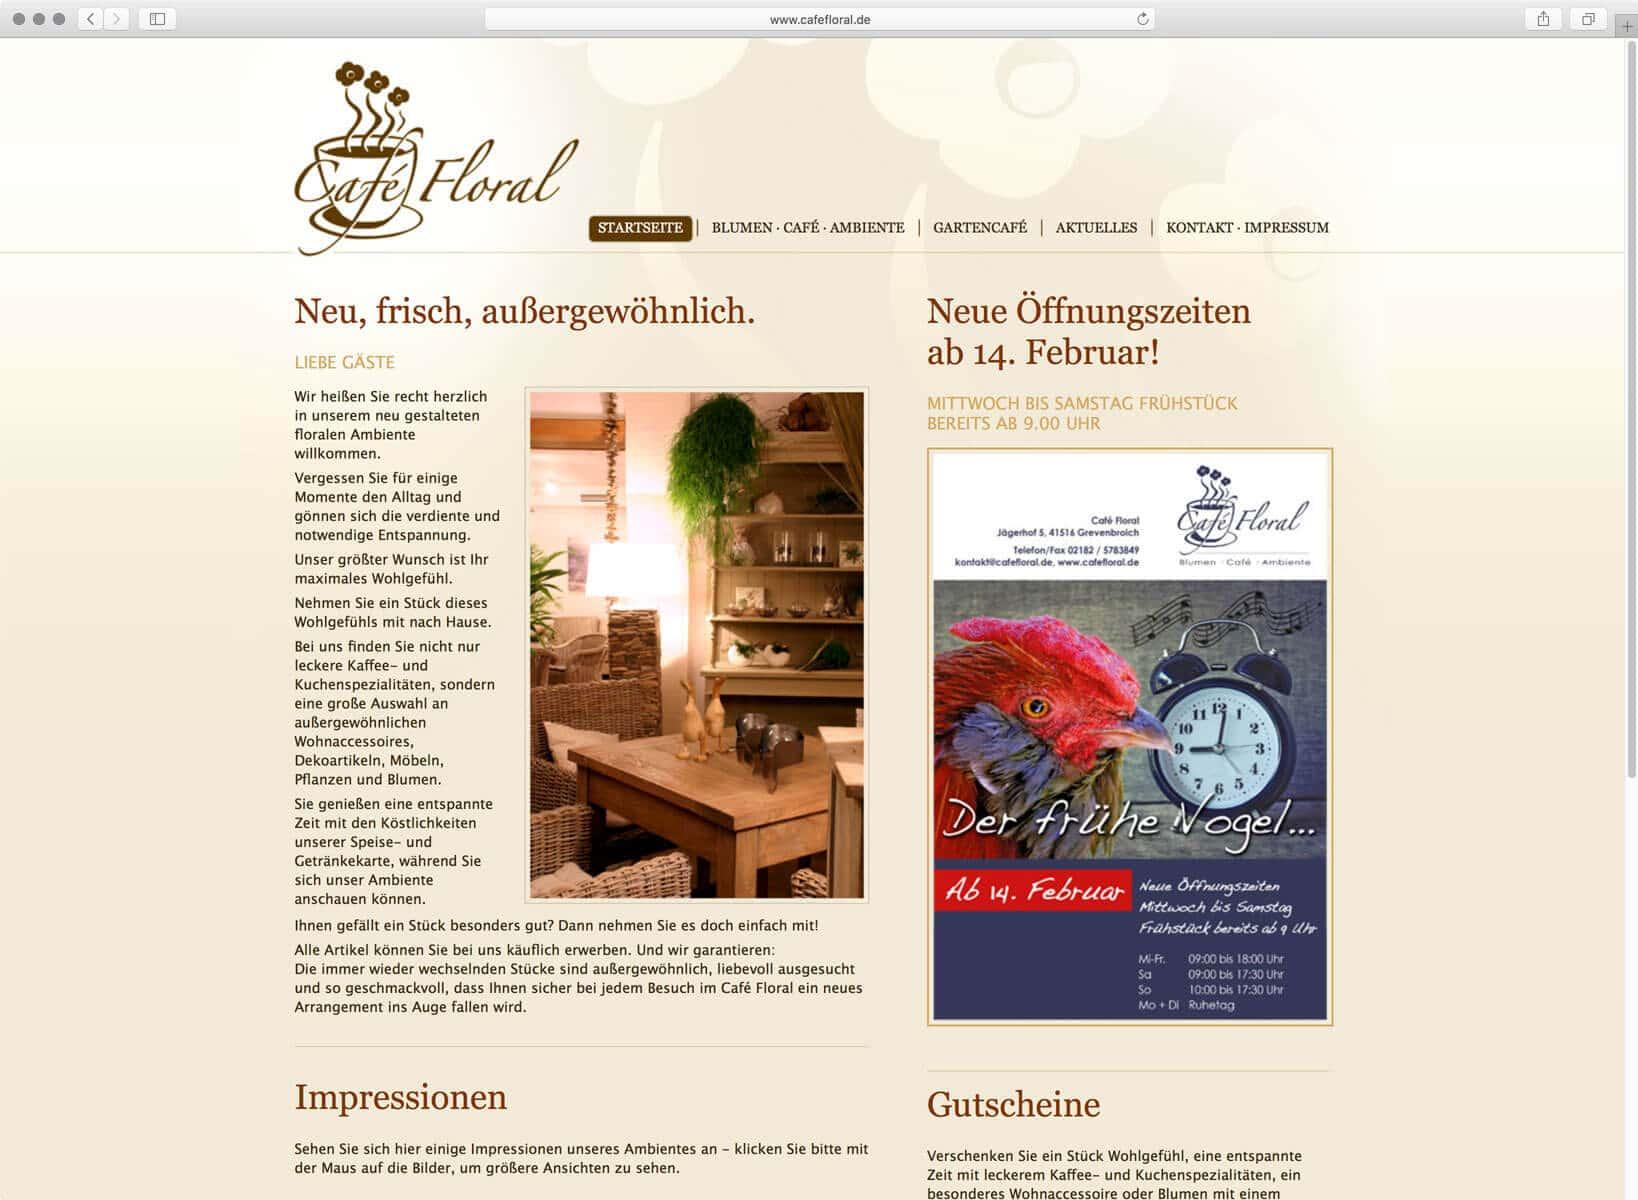 www.cafefloral.de